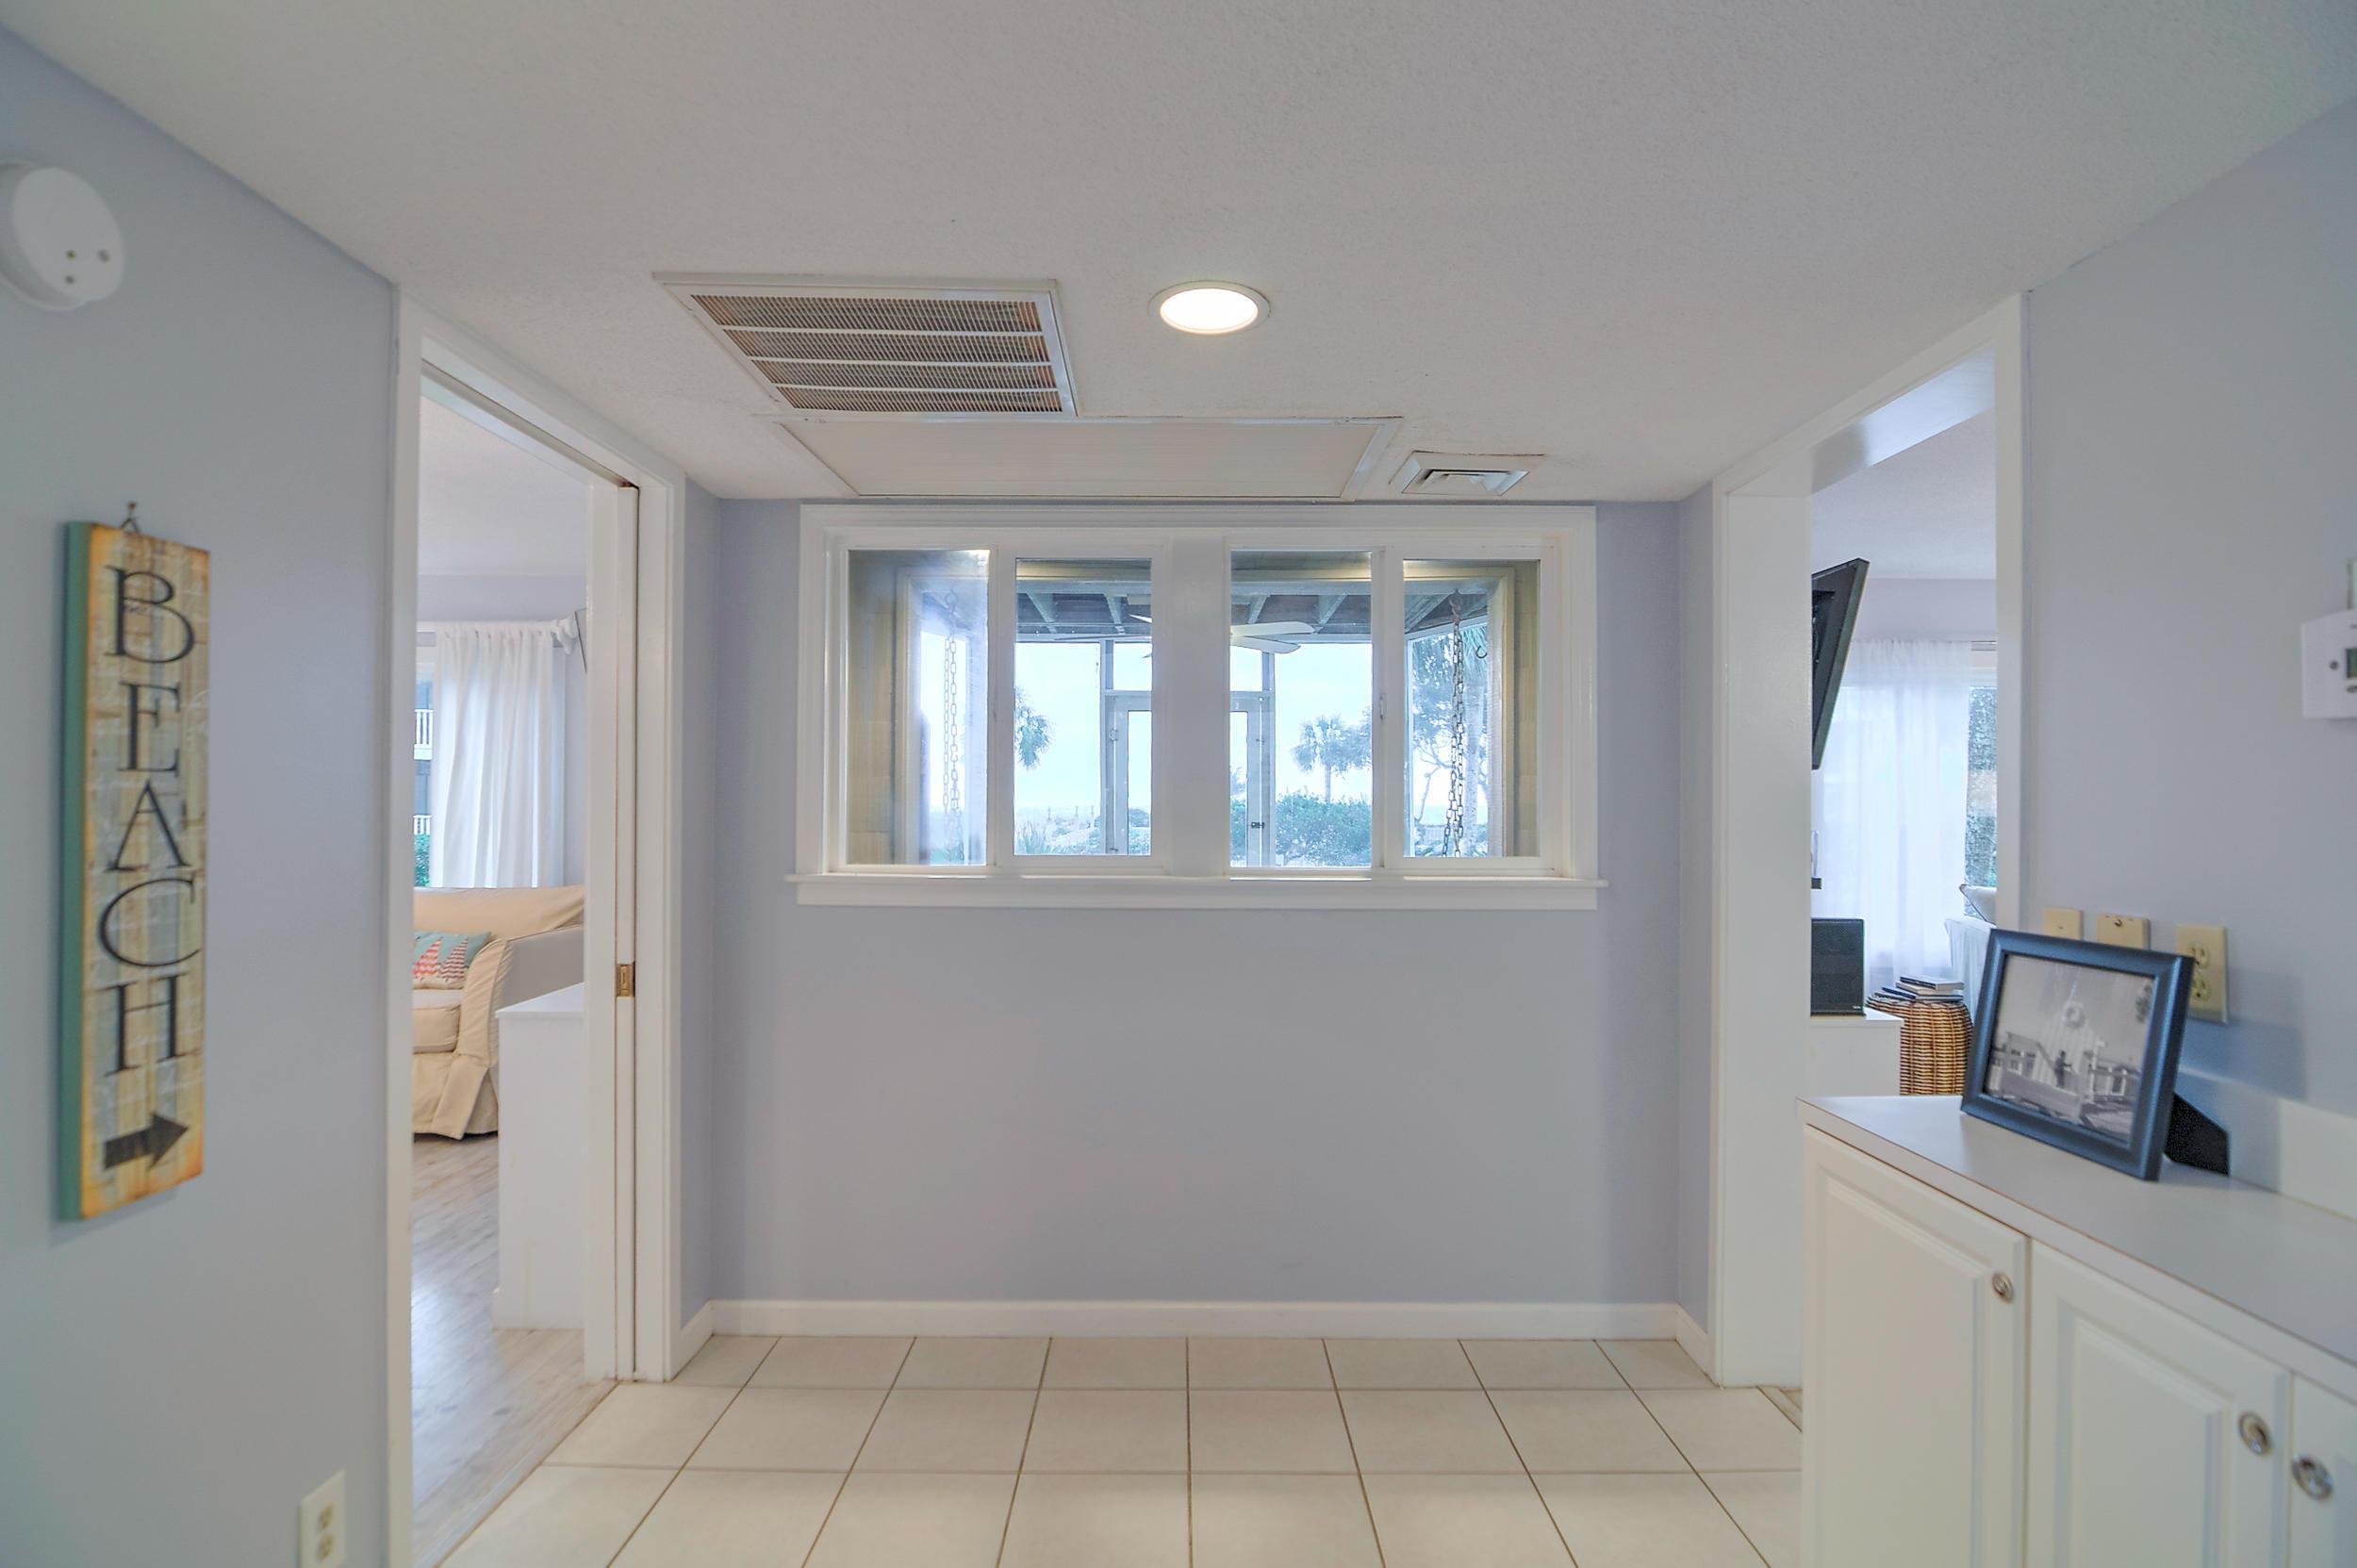 Port Ocall Homes For Sale - 103 Port O Call, Isle of Palms, SC - 0